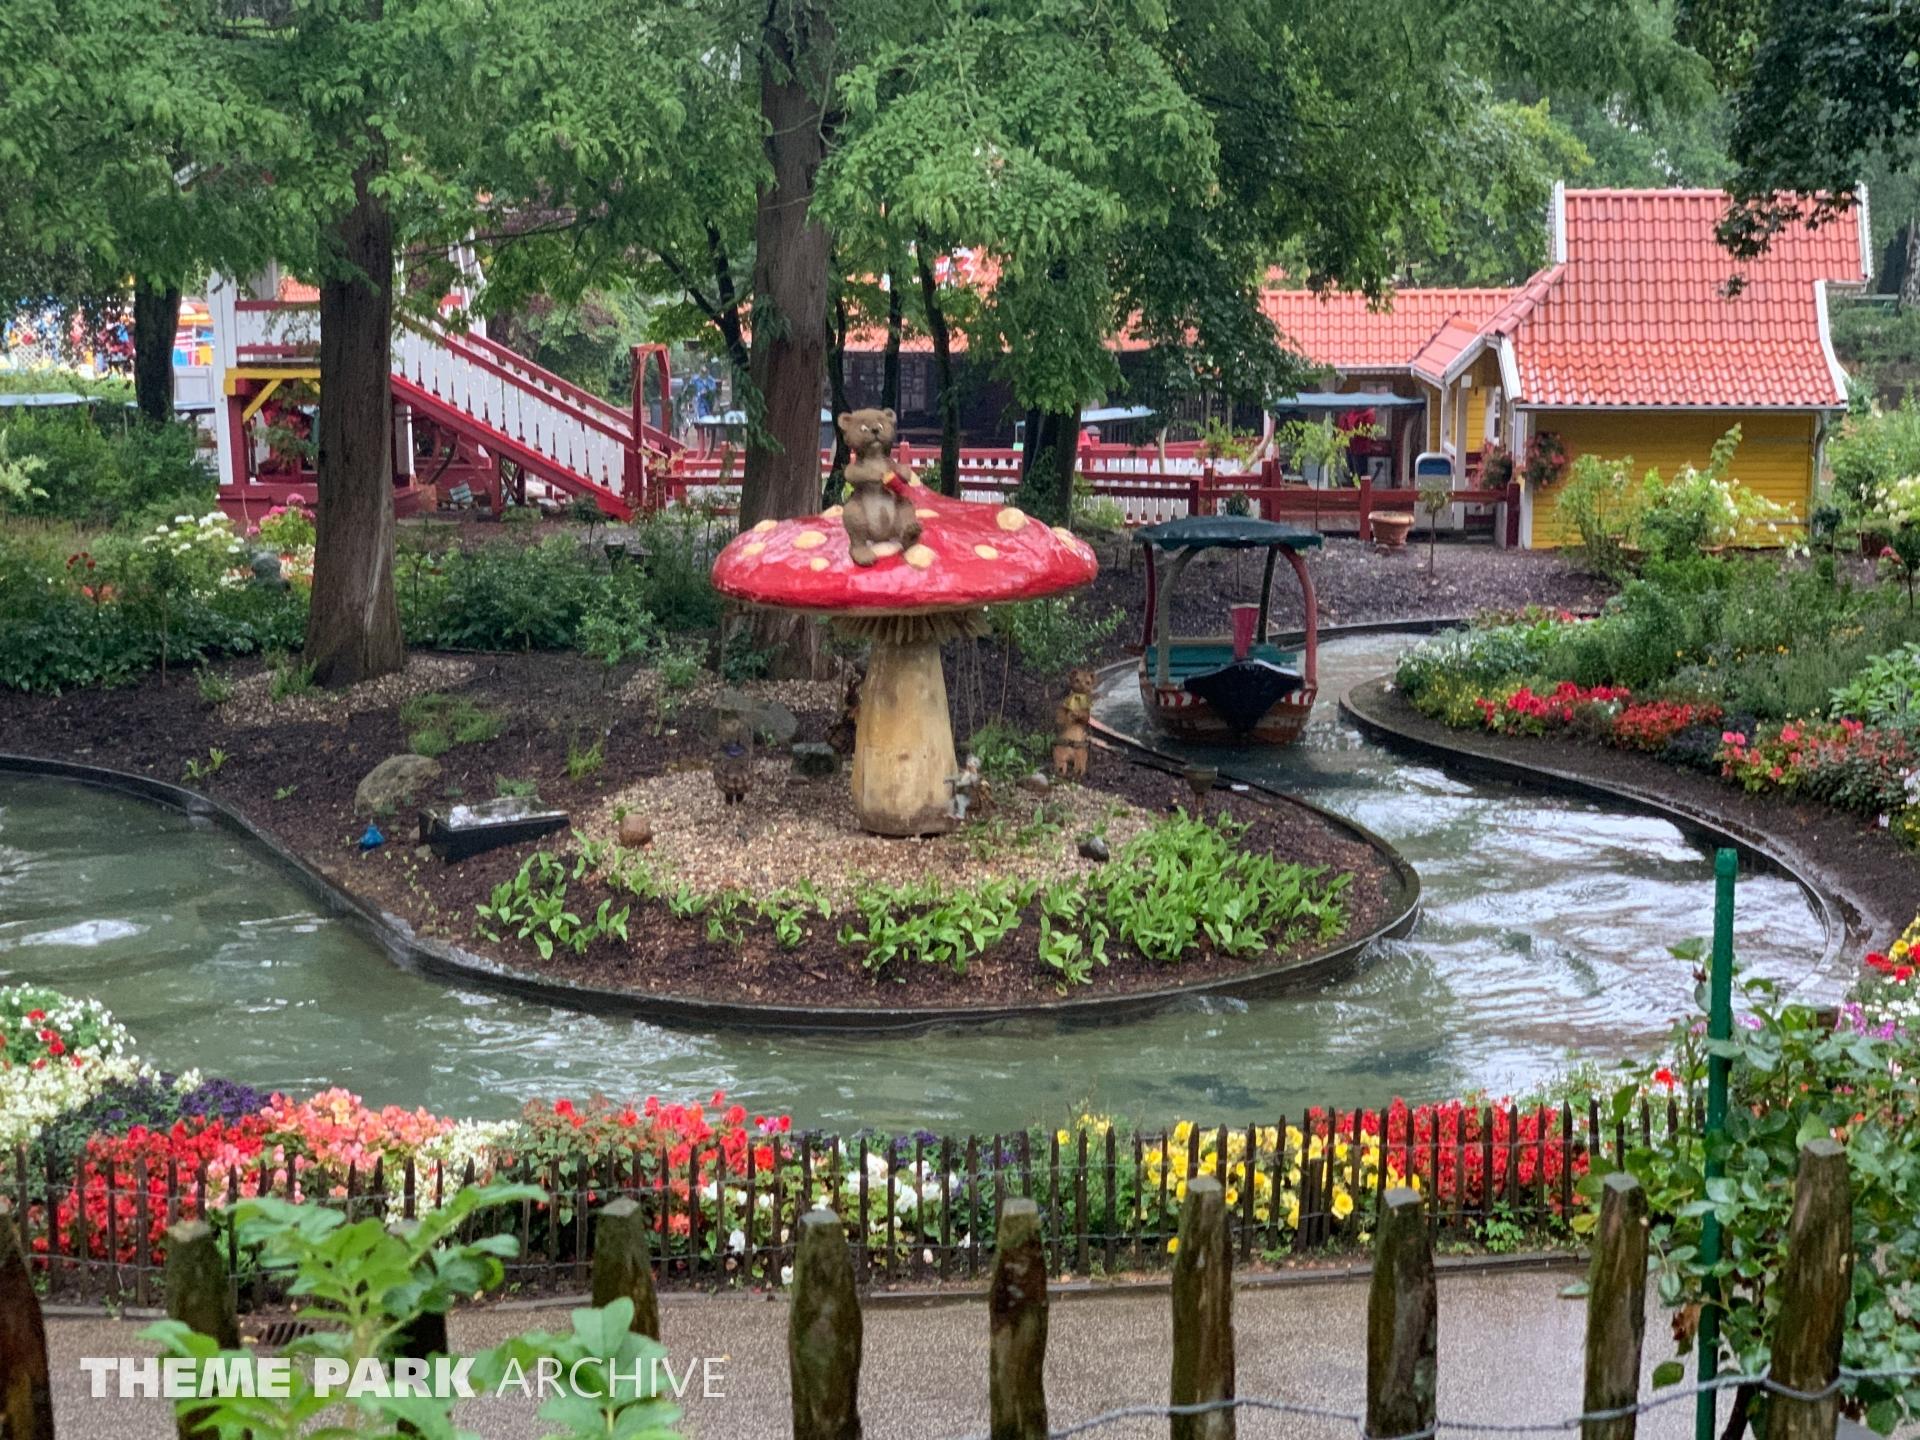 Blumenmeer Bootsfahrt at Hansa Park